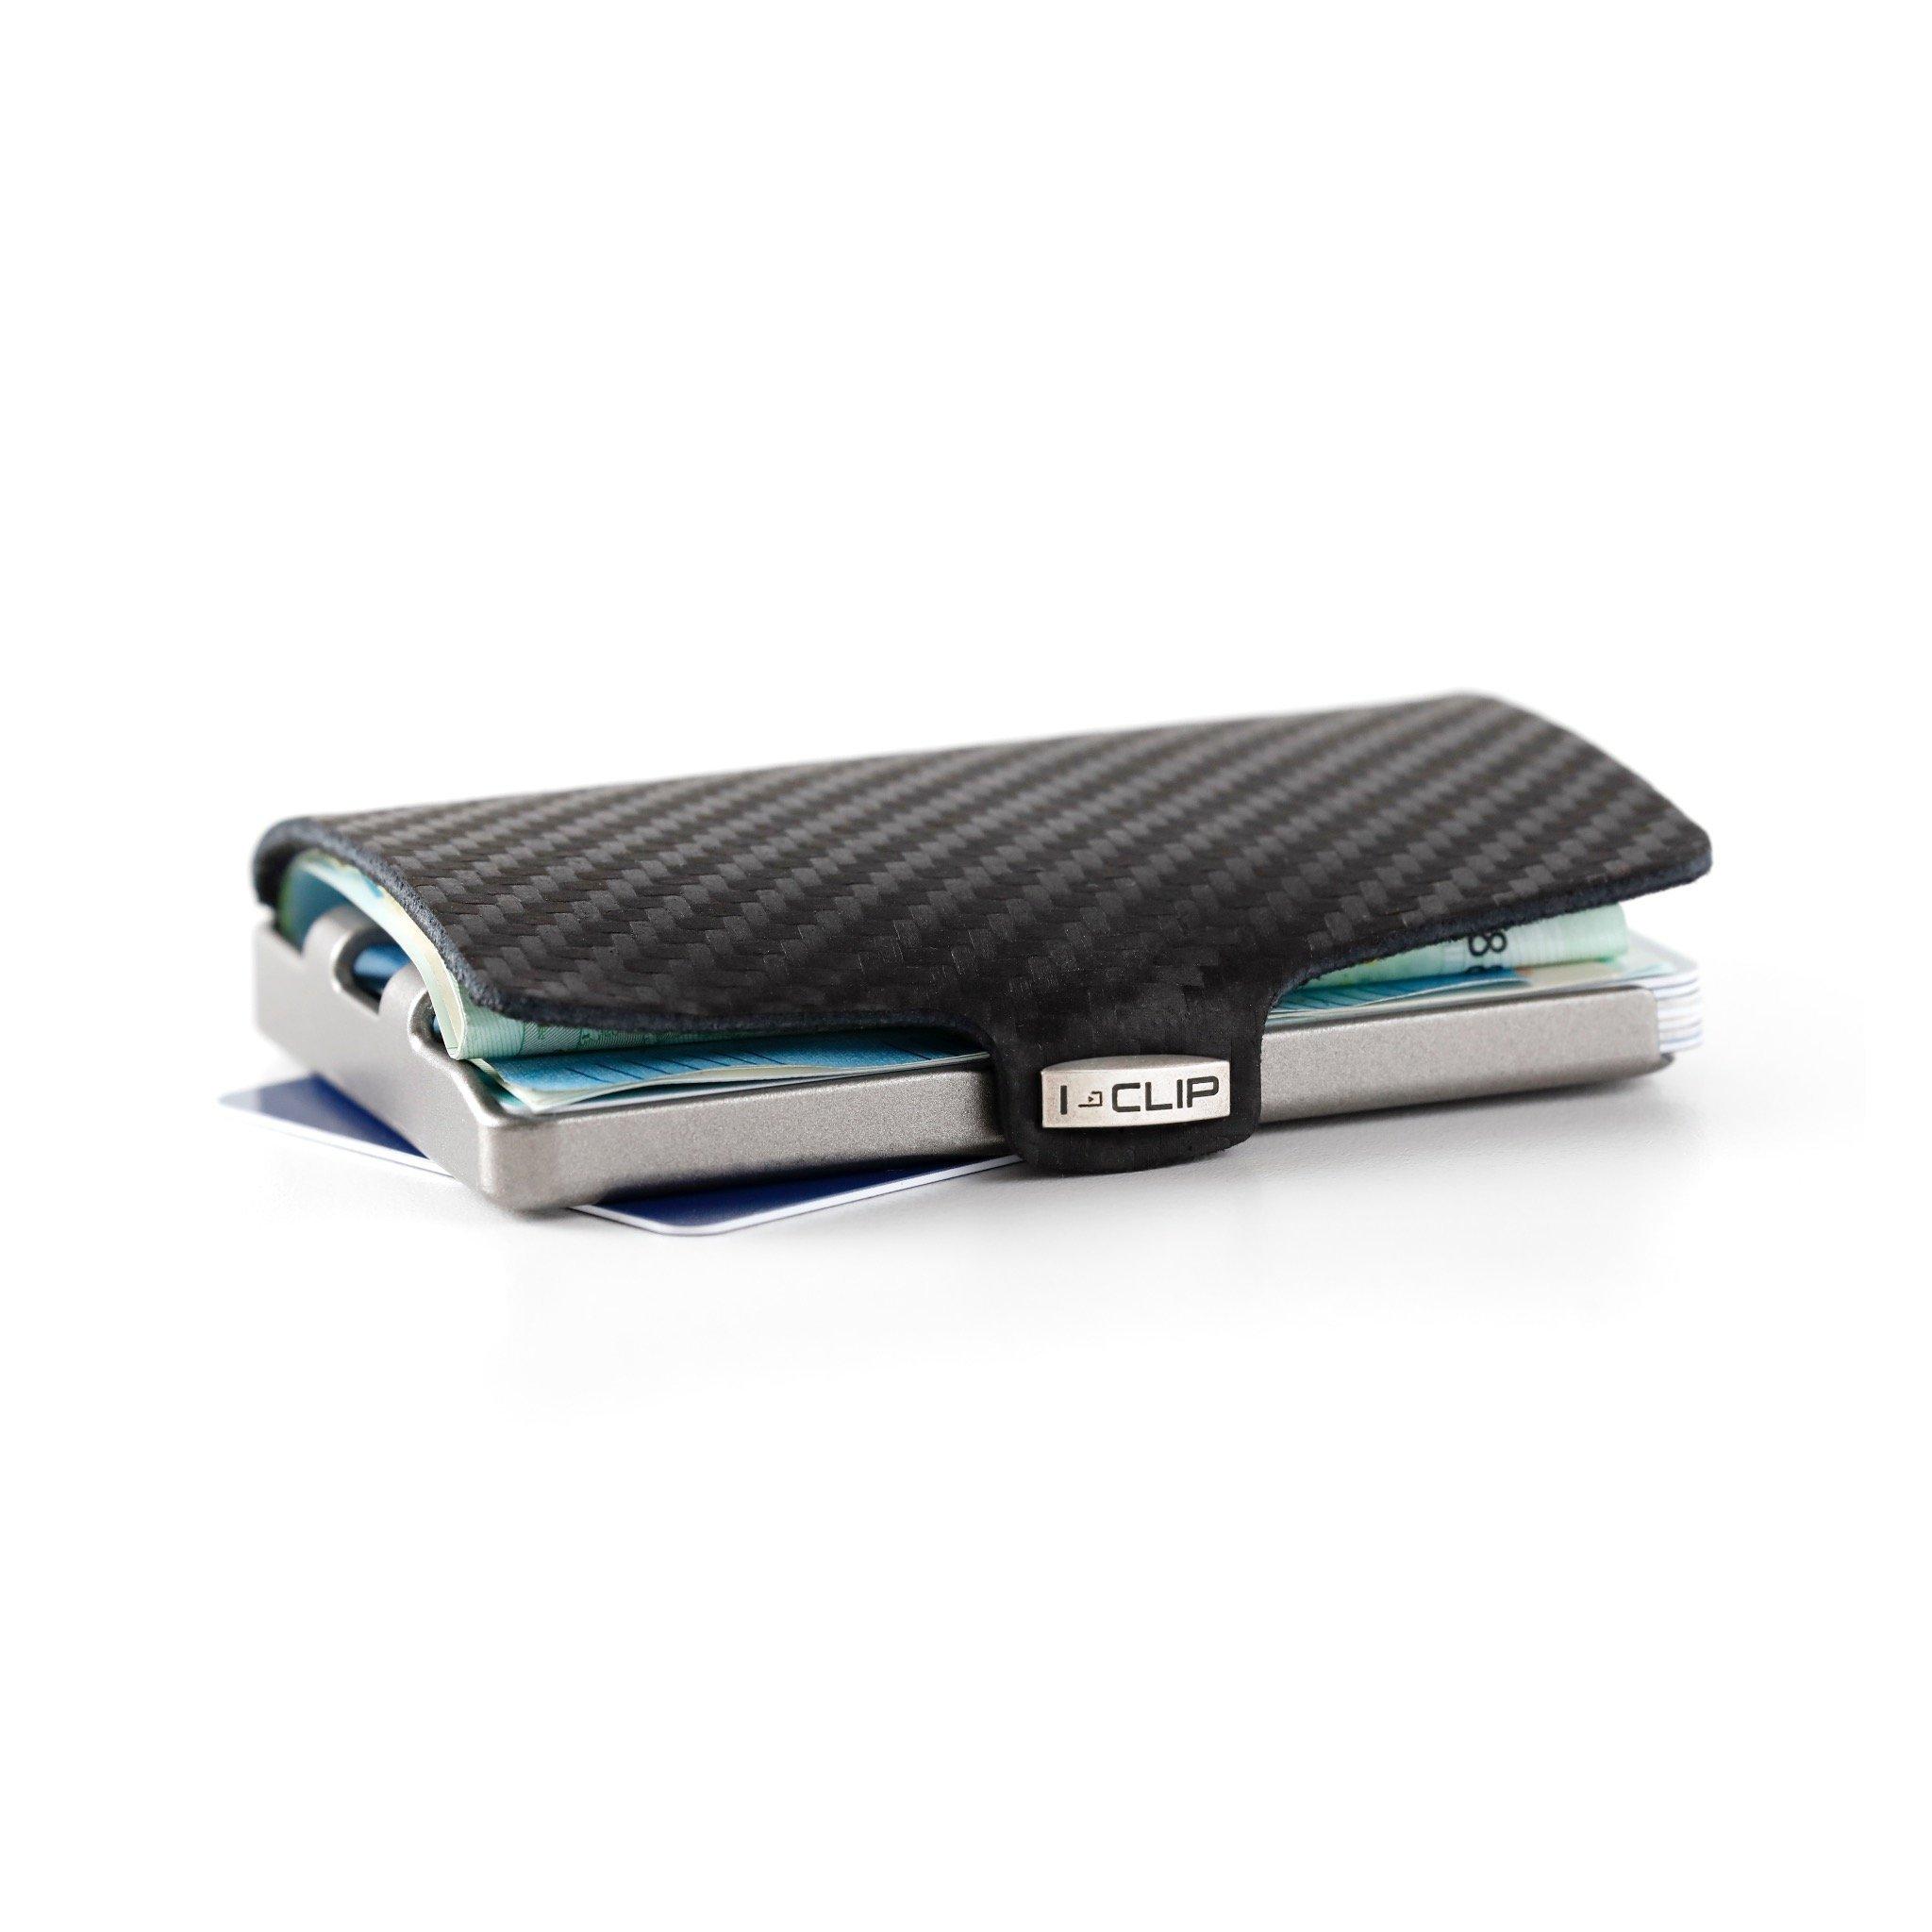 I-CLIP - Carbon Fiber - Slim Wallet - Minimalist, Thin Design & Money Clip